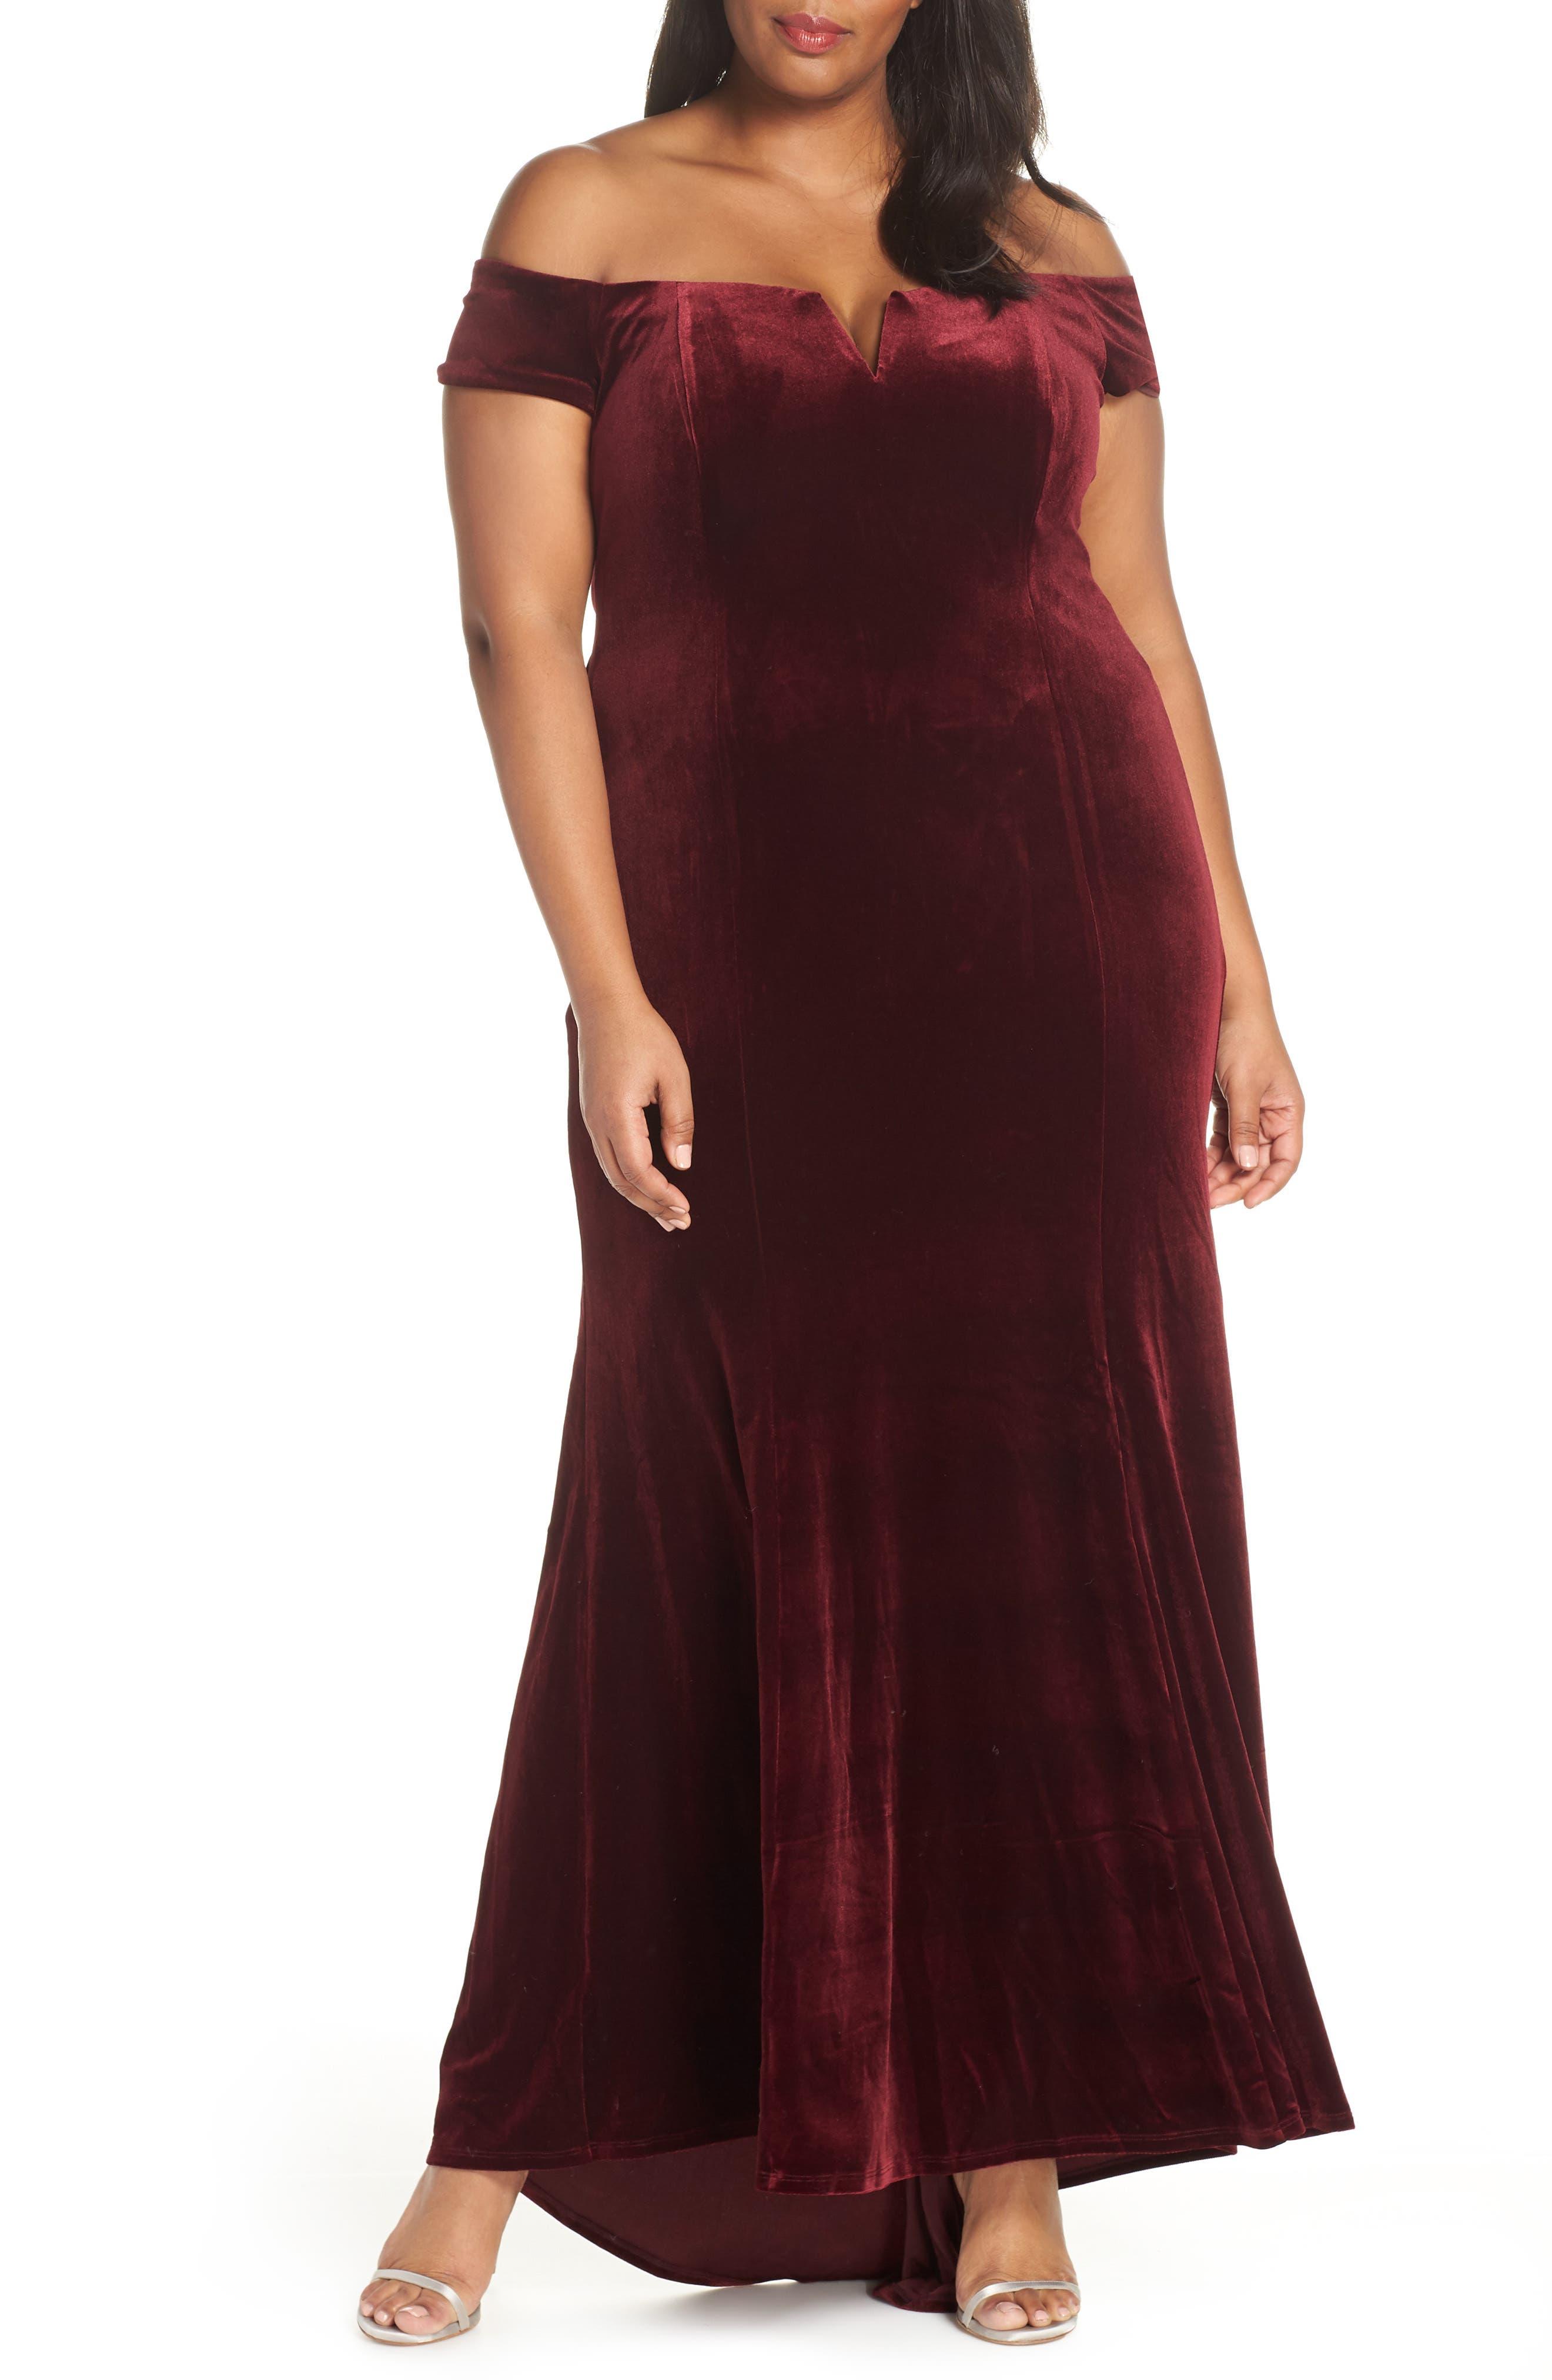 VINCE CAMUTO Notch Neck Velvet Off the Shoulder Gown, Main, color, 930